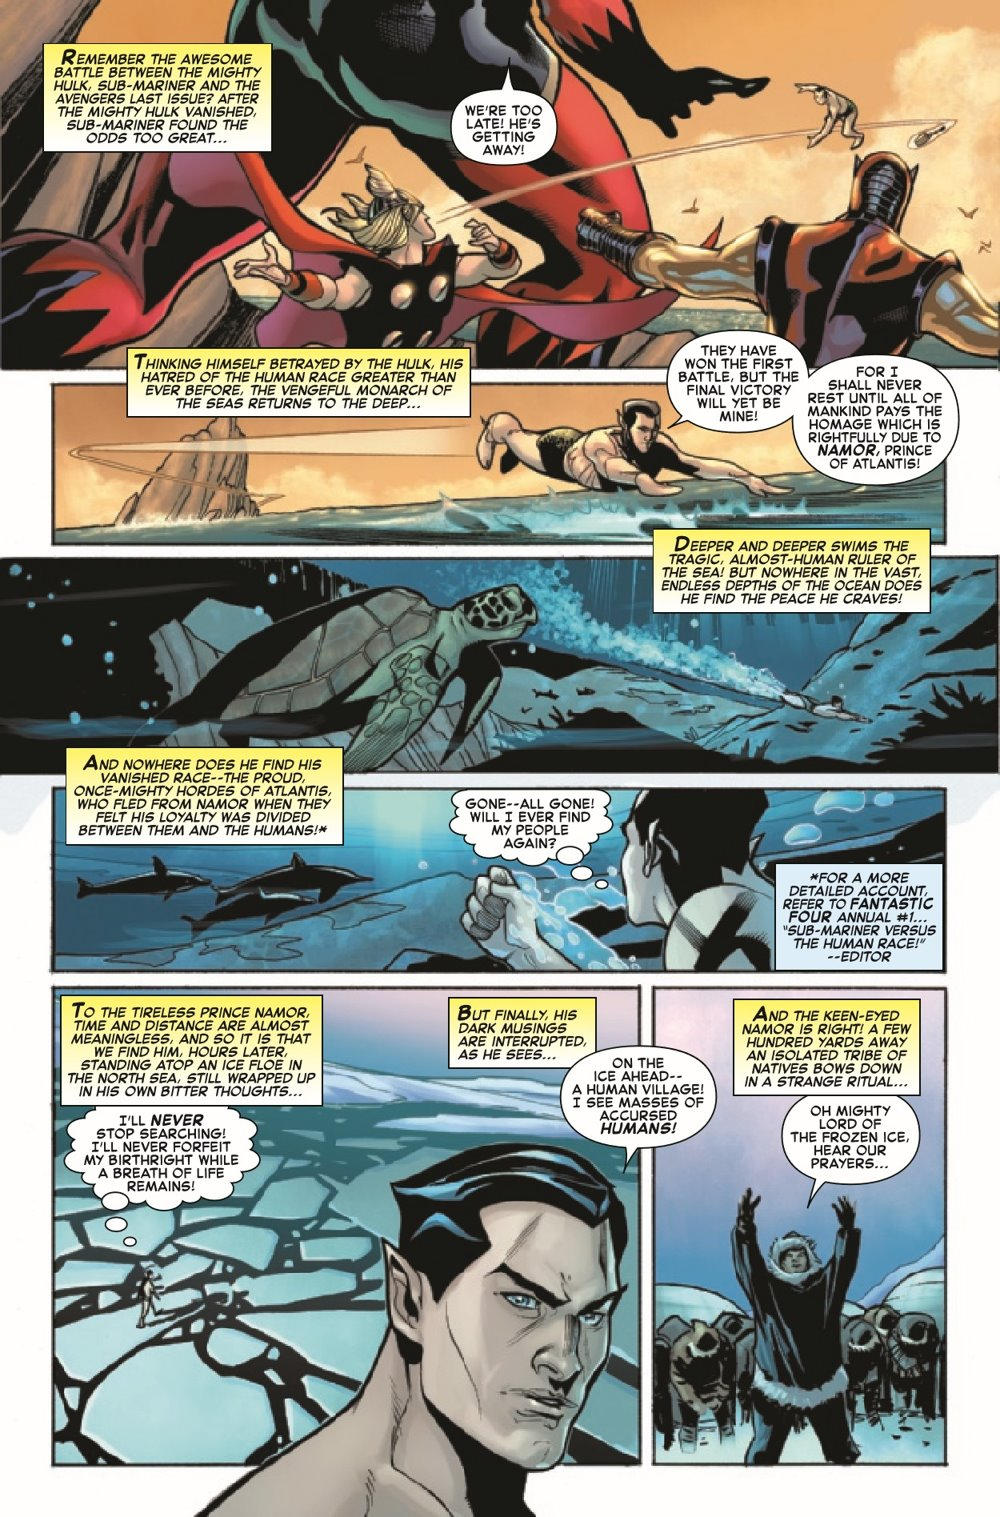 CAPAANNIVERSARY2021001_Preview-5 ComicList Previews: CAPTAIN AMERICA ANNIVERSARY TRIBUTE #1